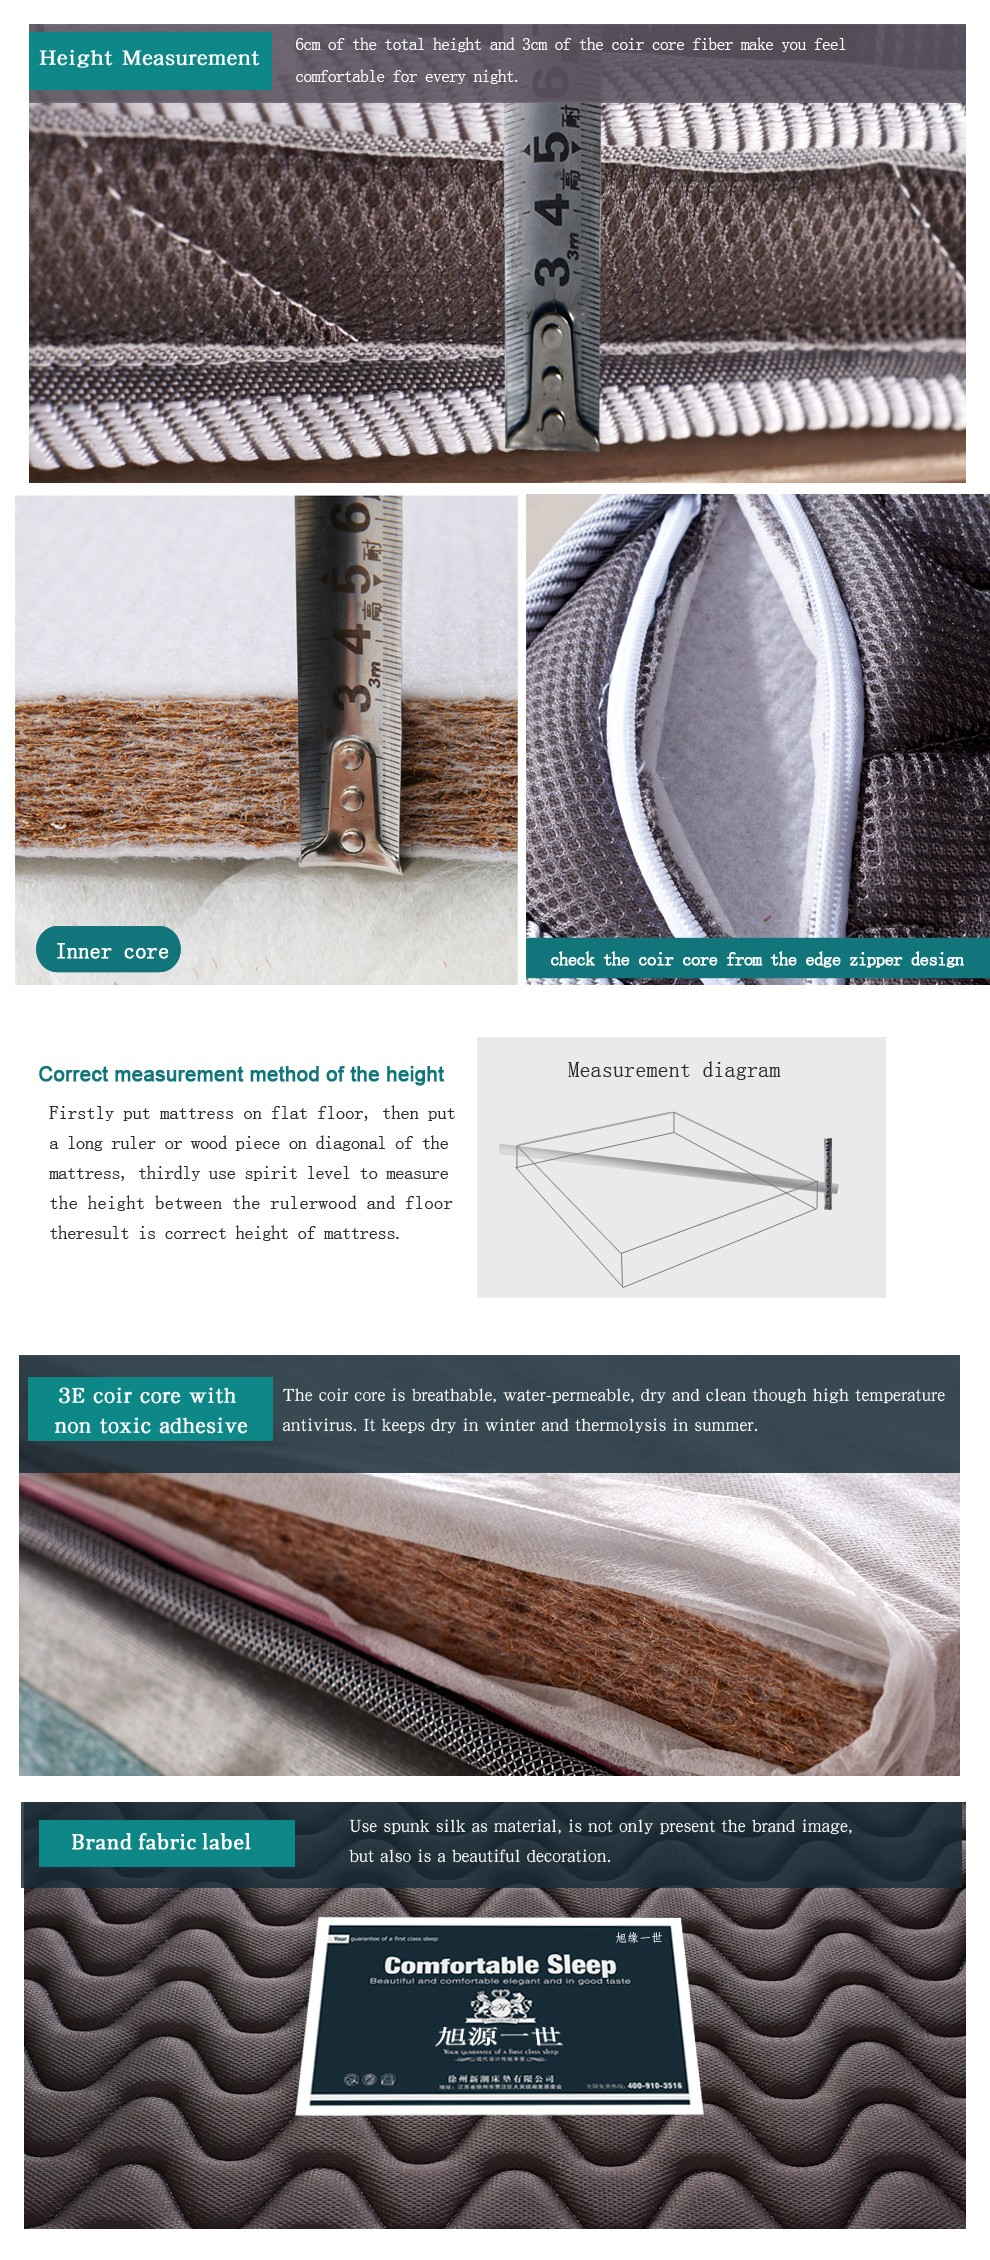 King size soft palm mattress natural coconut fiber mattress - Jozy Mattress | Jozy.net